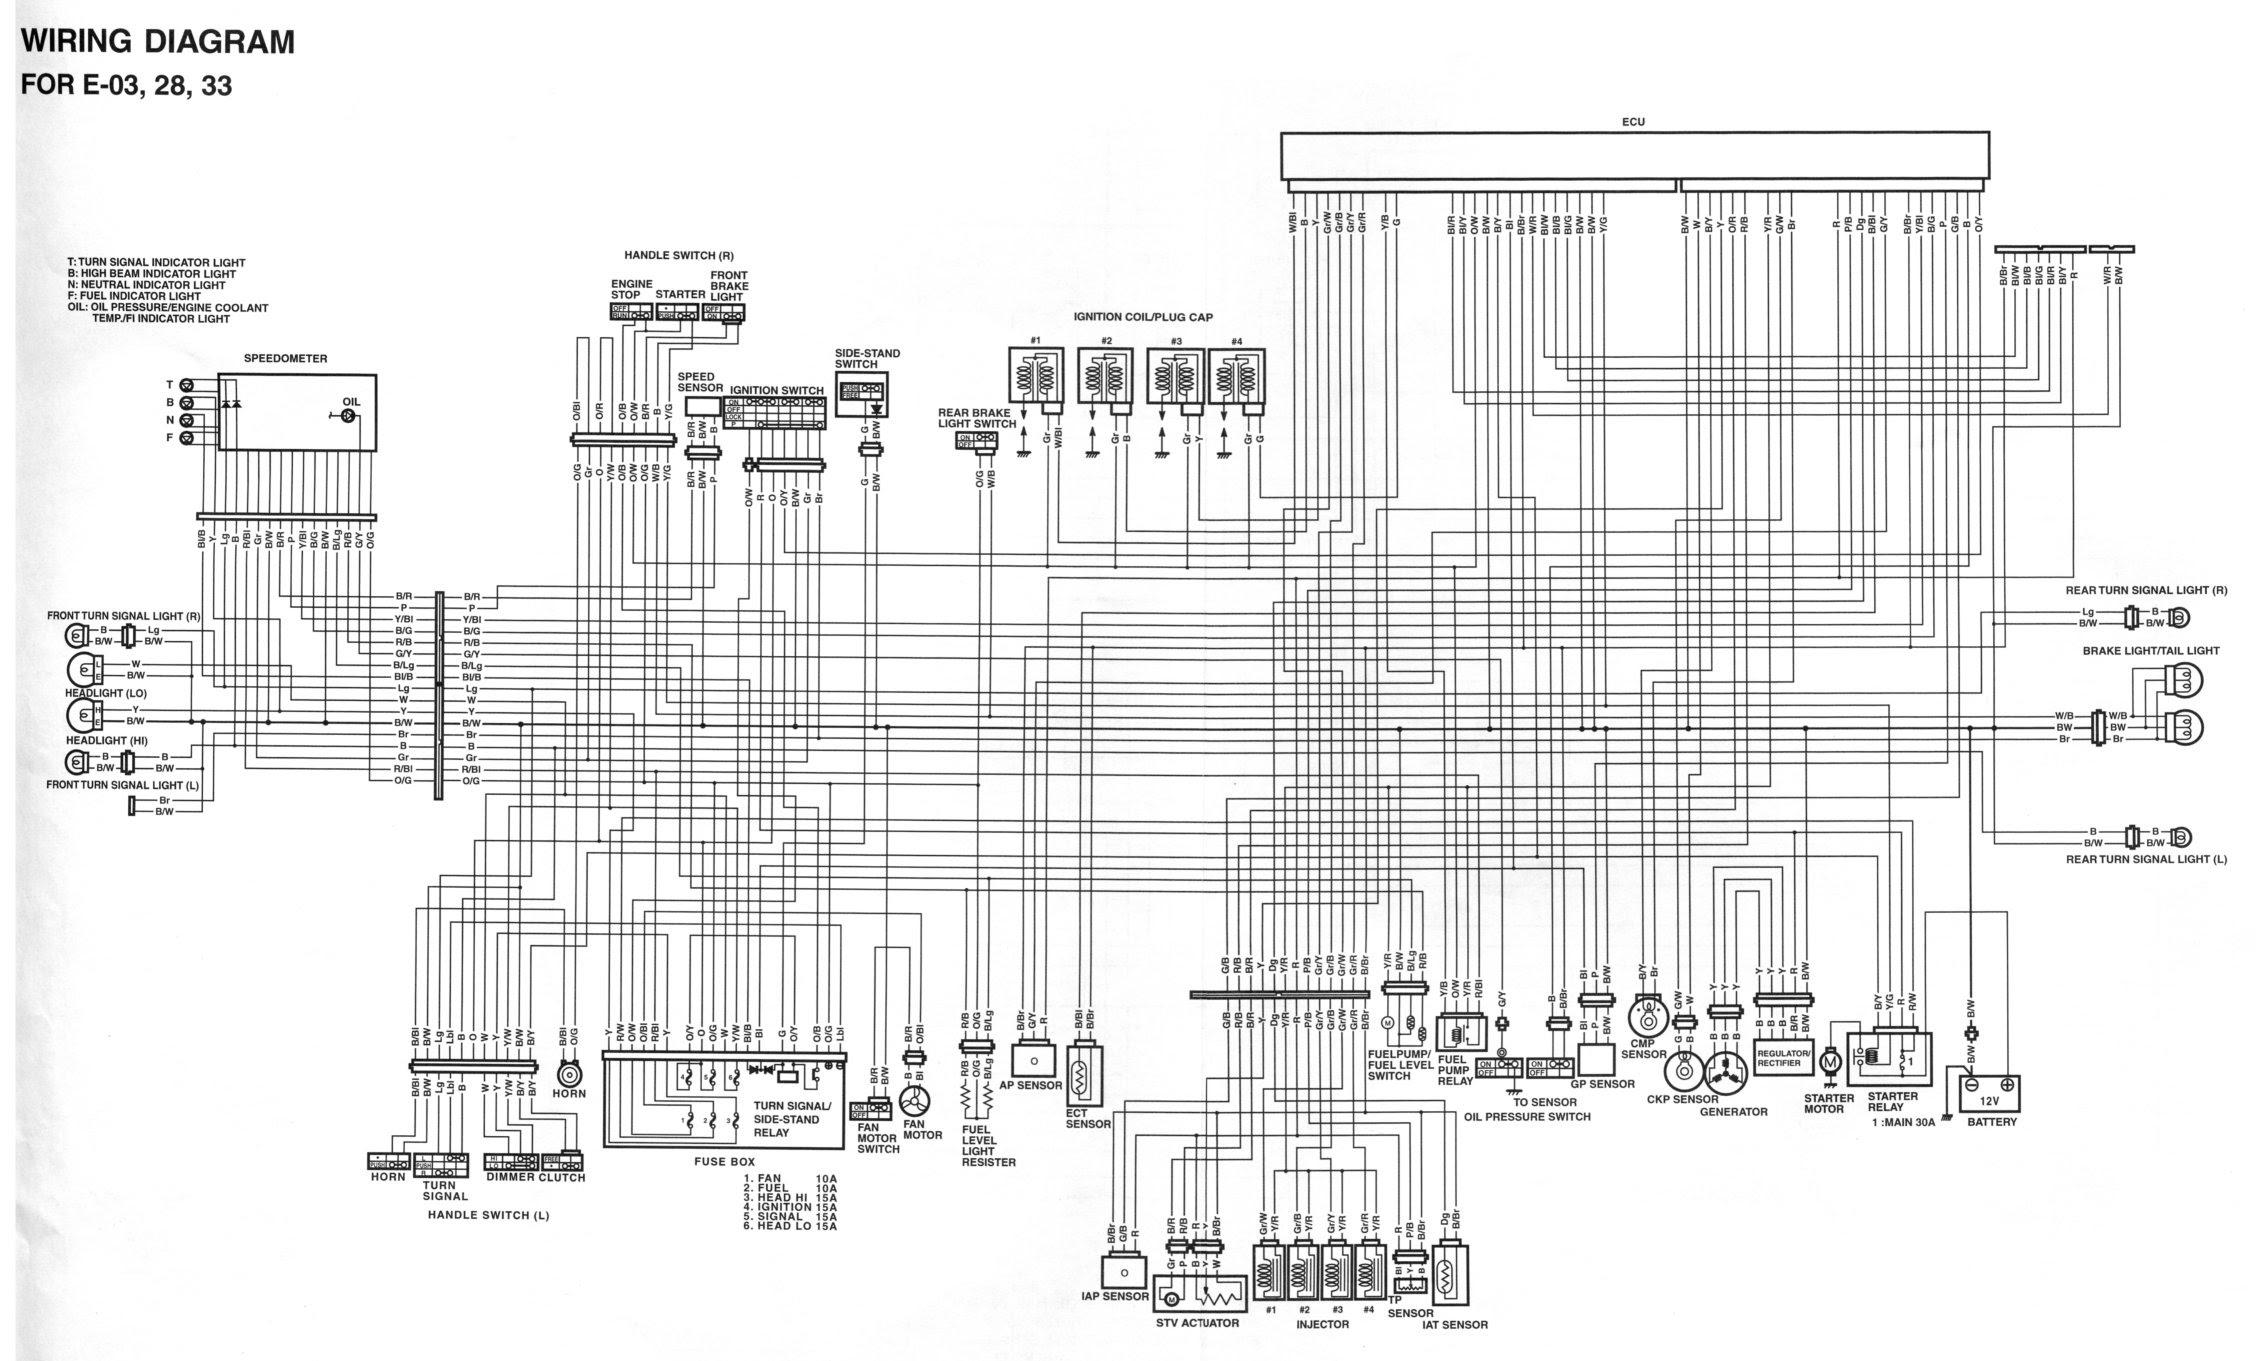 Diagram 2006 Gsxr Sdo Wiring Diagram Full Version Hd Quality Wiring Diagram Csiwiring Villaroveri It